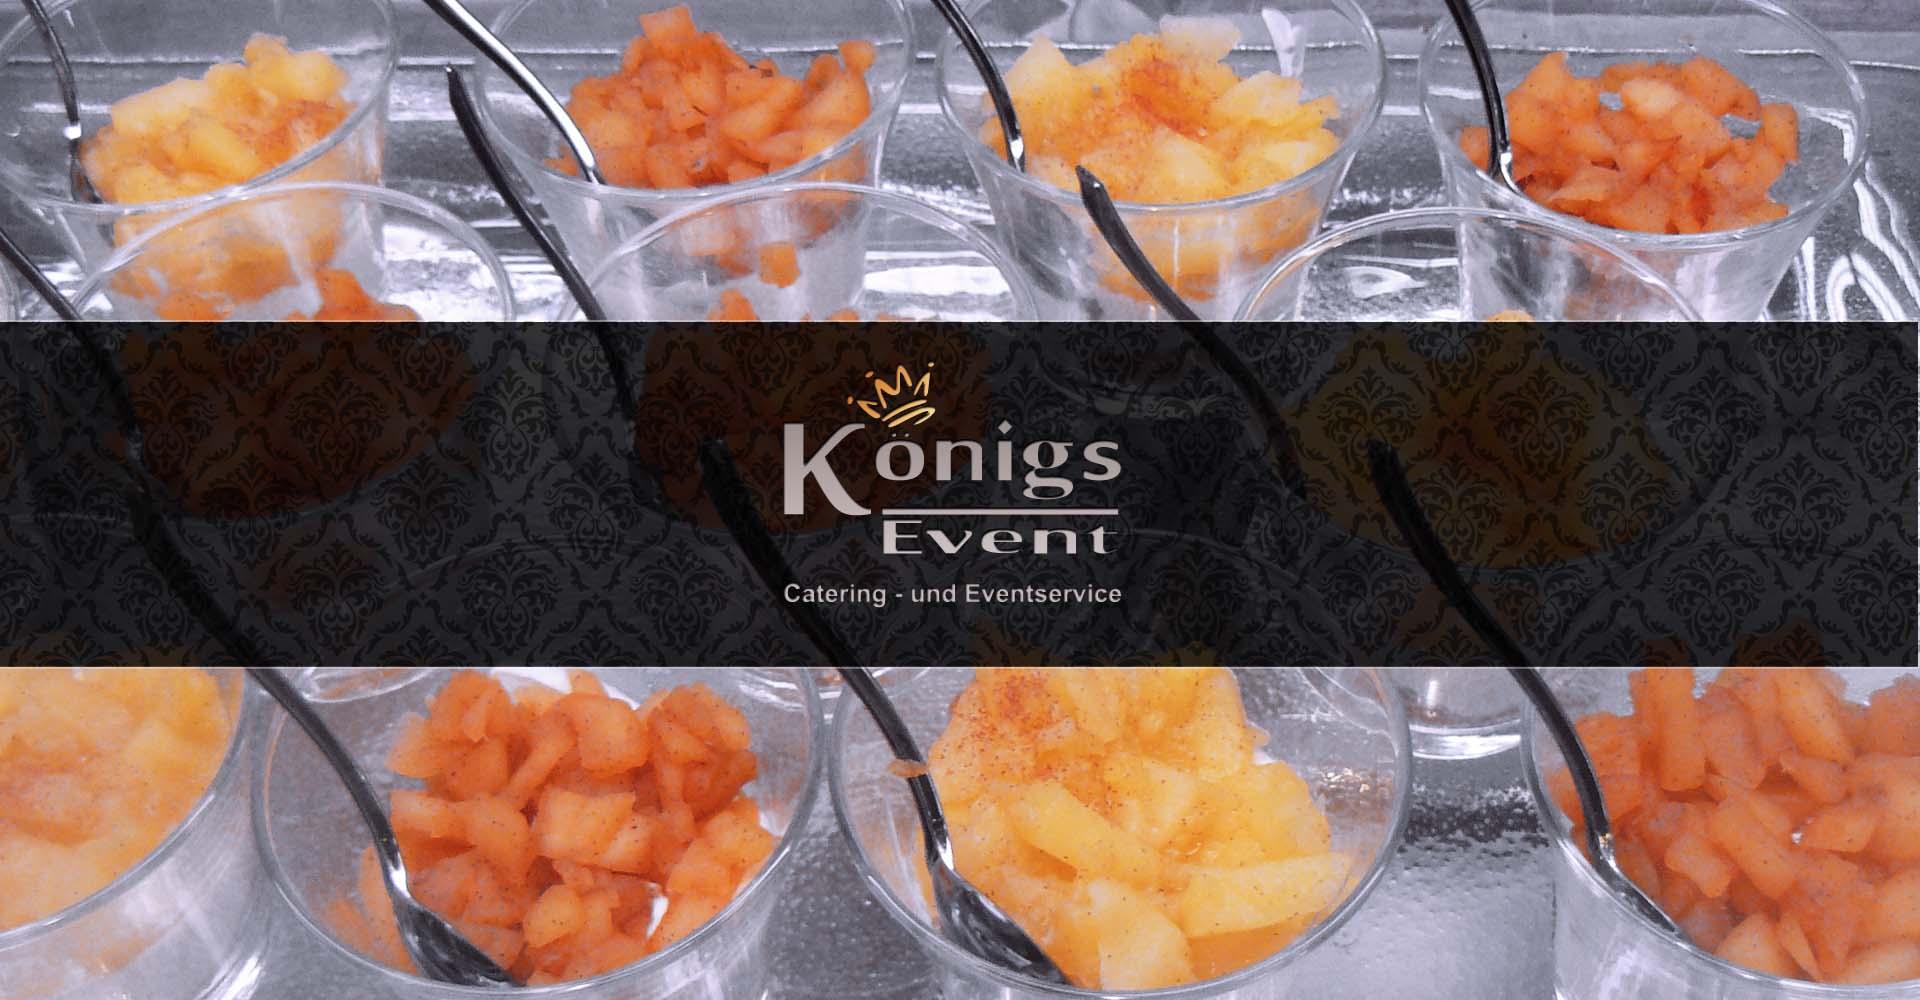 2015-05-26-Startbild-Koenigs-event-11-2